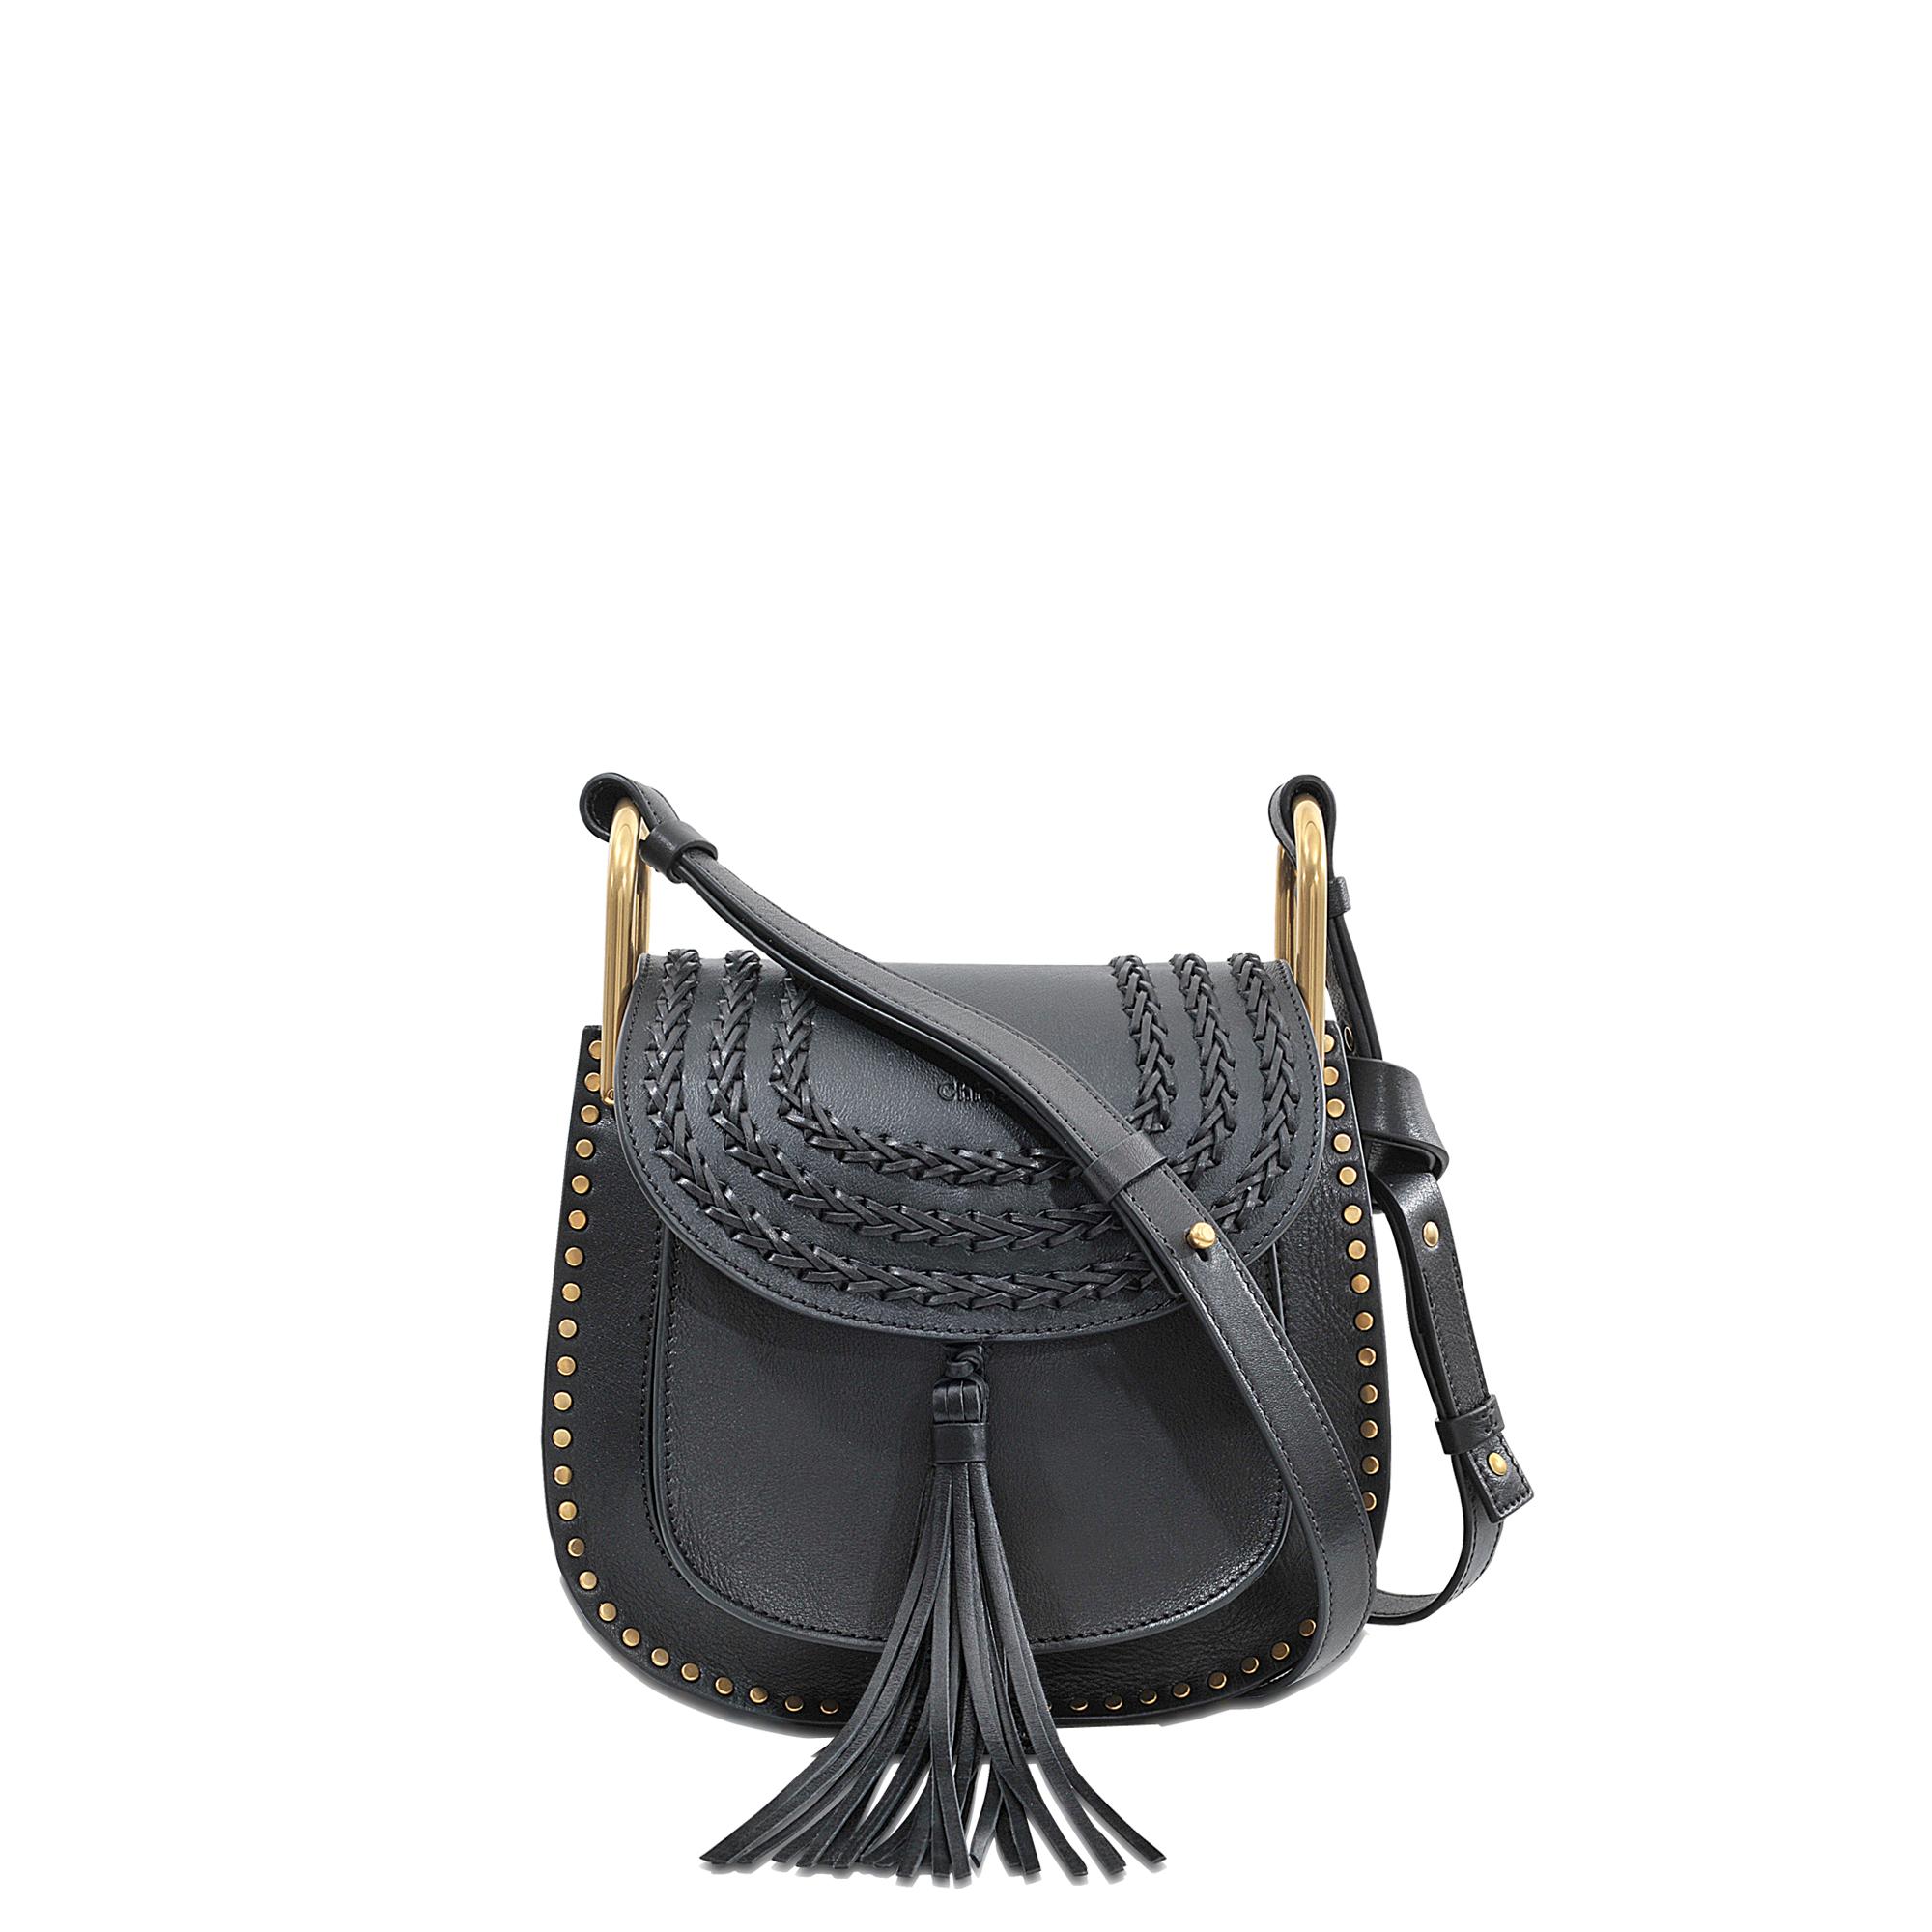 2f061fbb0 Chloé Hudson Small Shoulder Bag in Black - Lyst